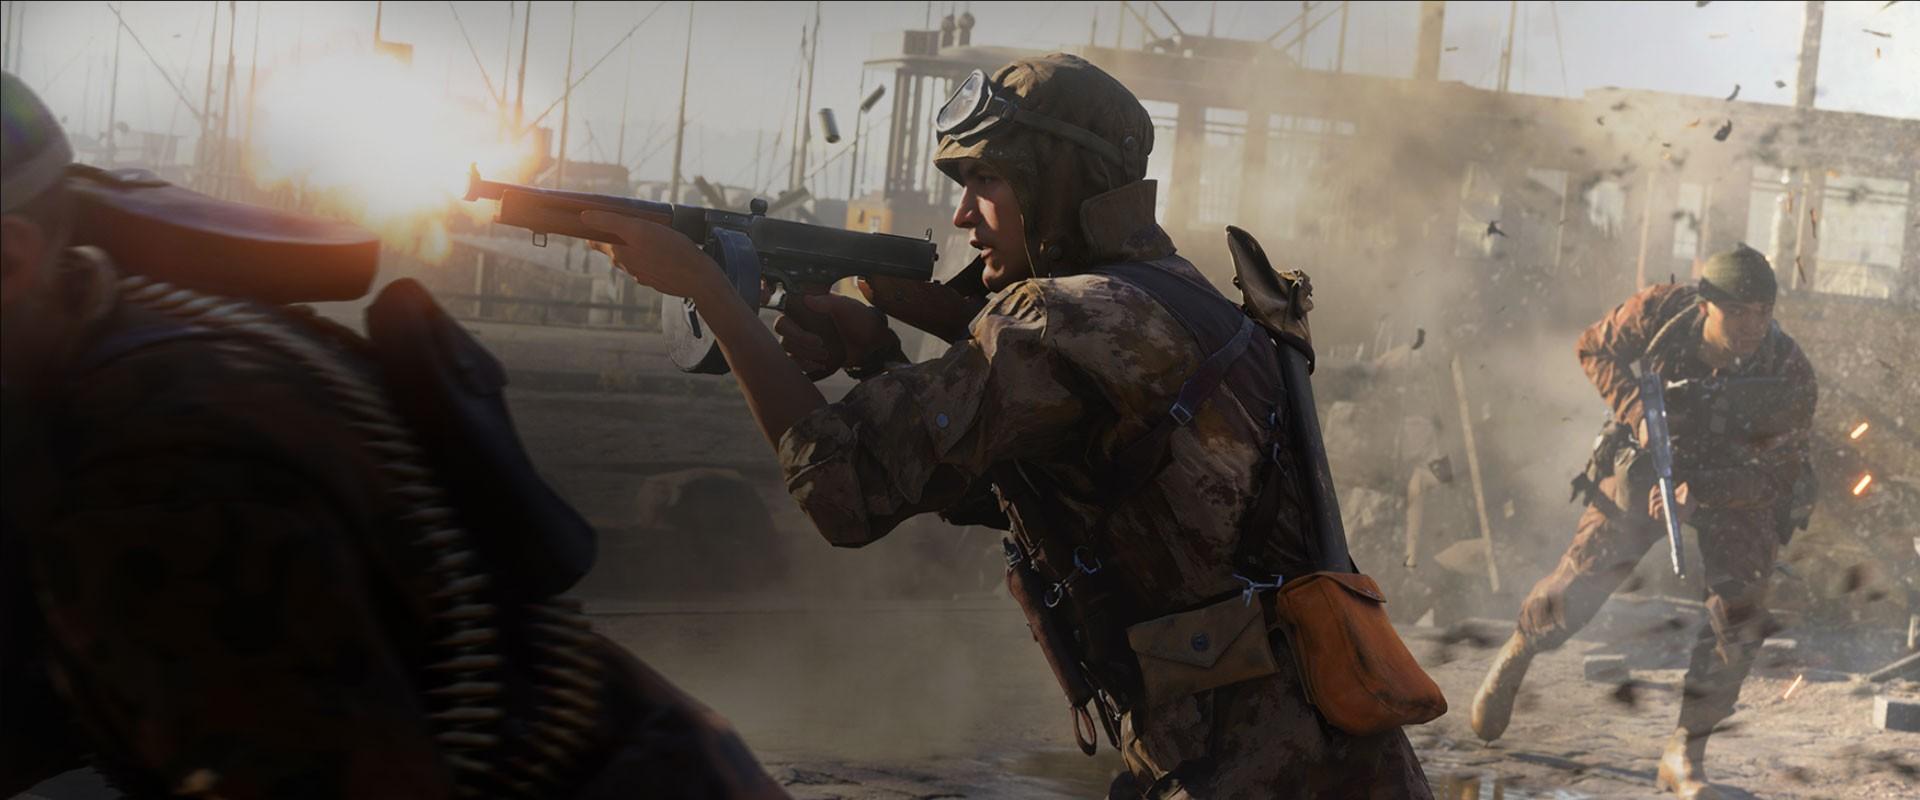 Battlefield 3: Close Quarters for PC Origin